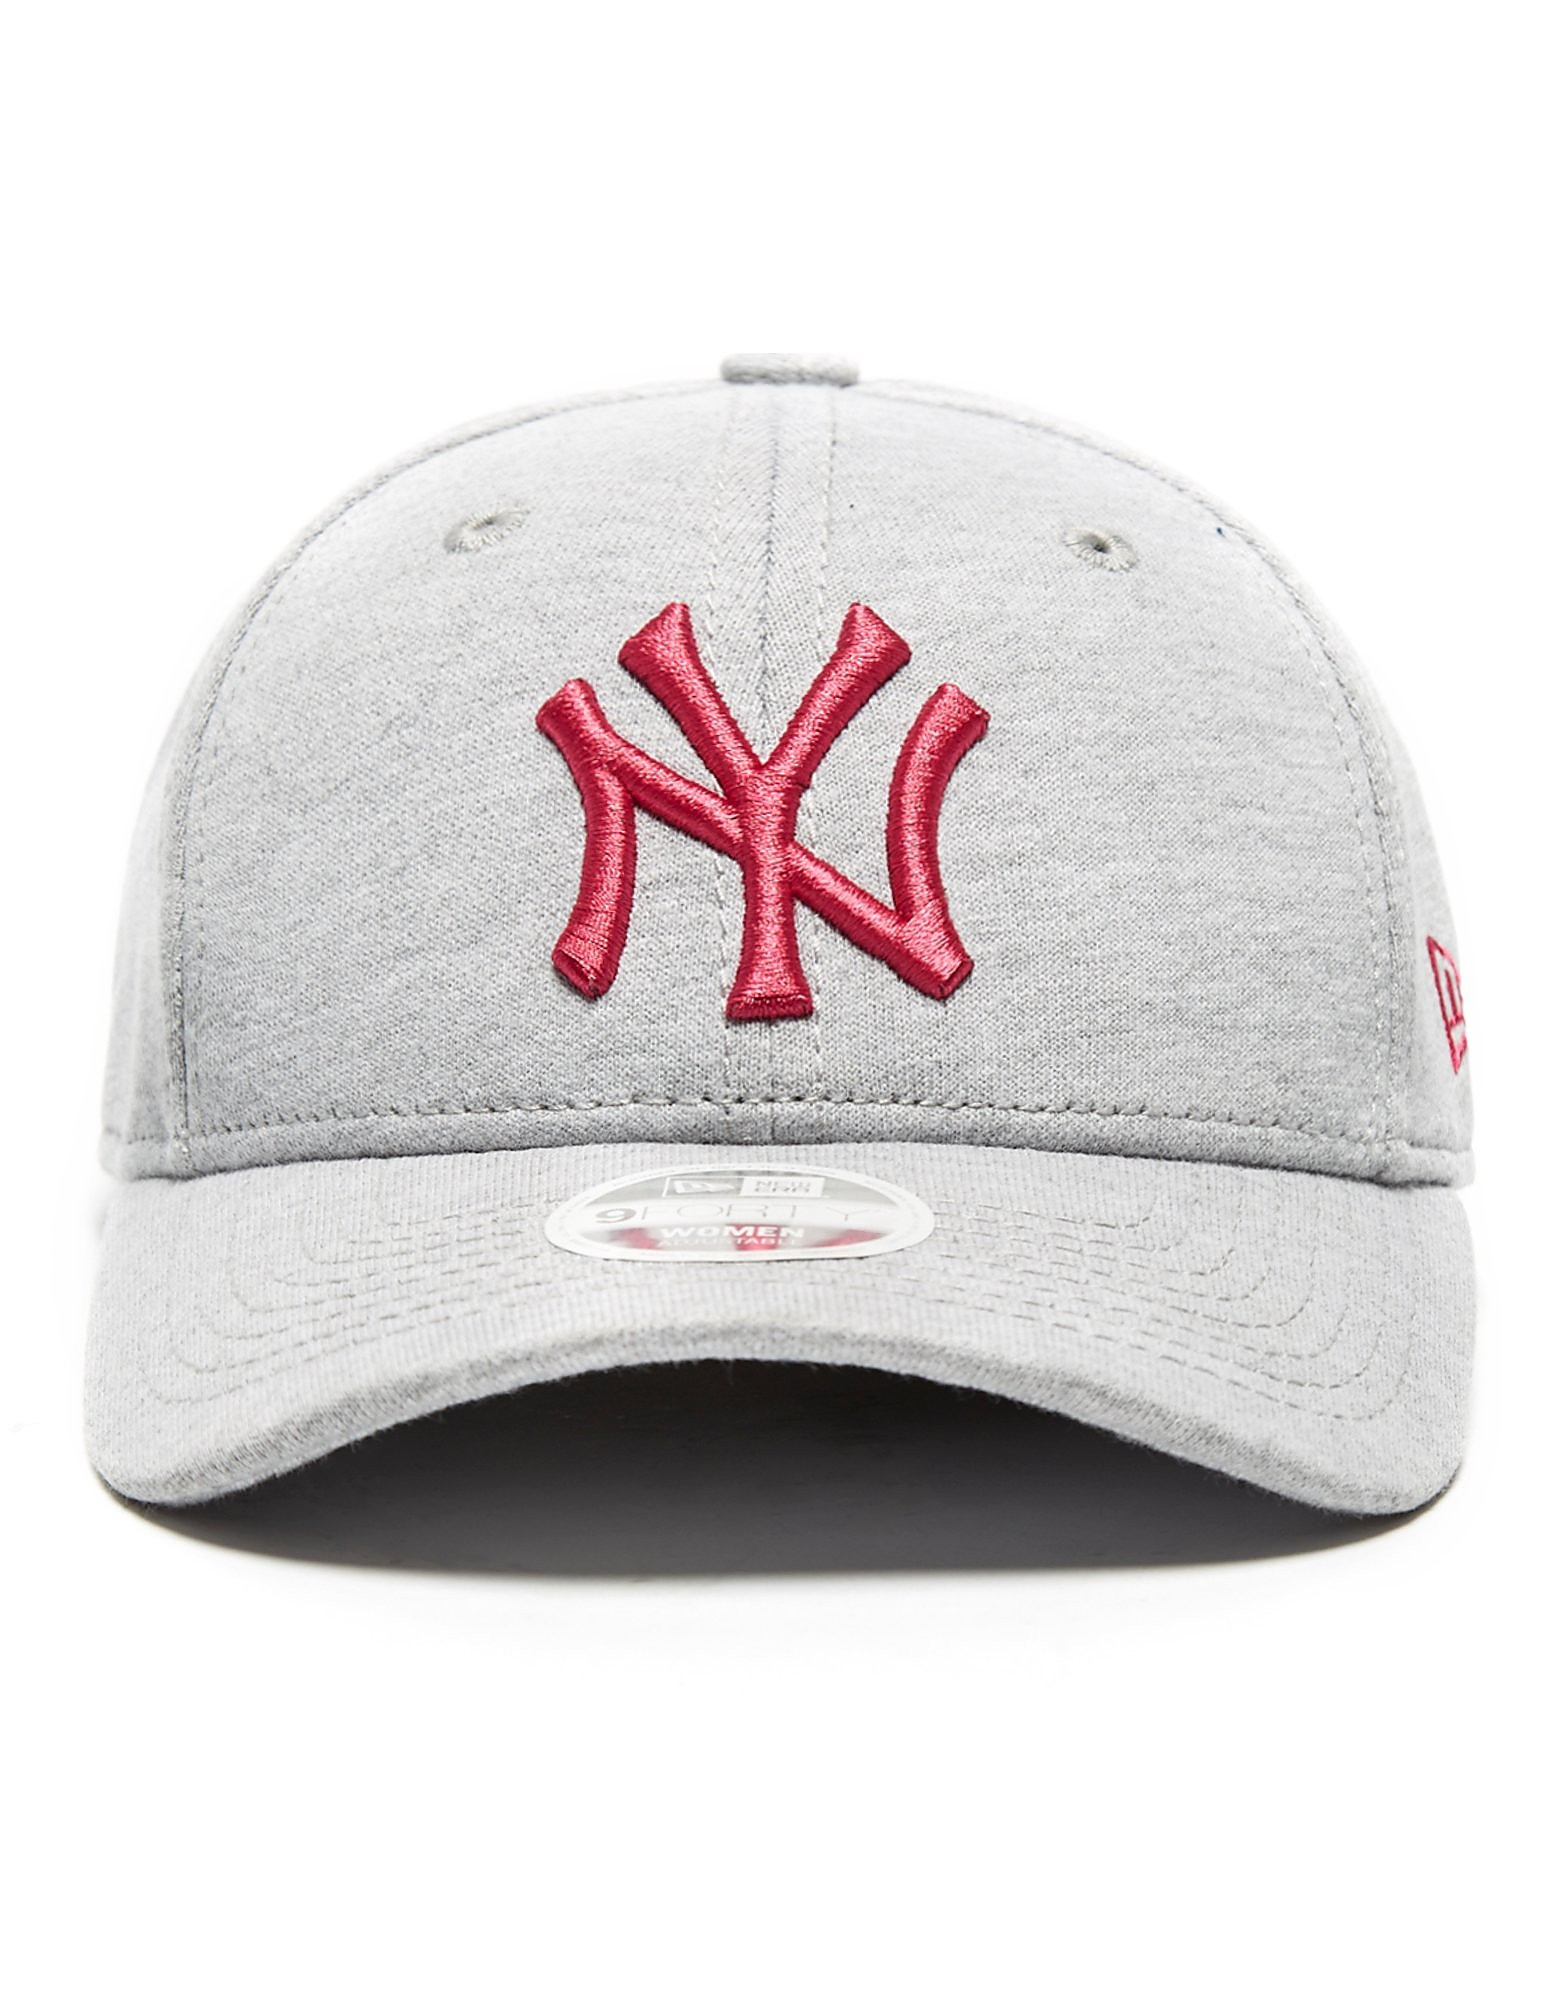 New Era 9Forty Yankees Strapback Cap